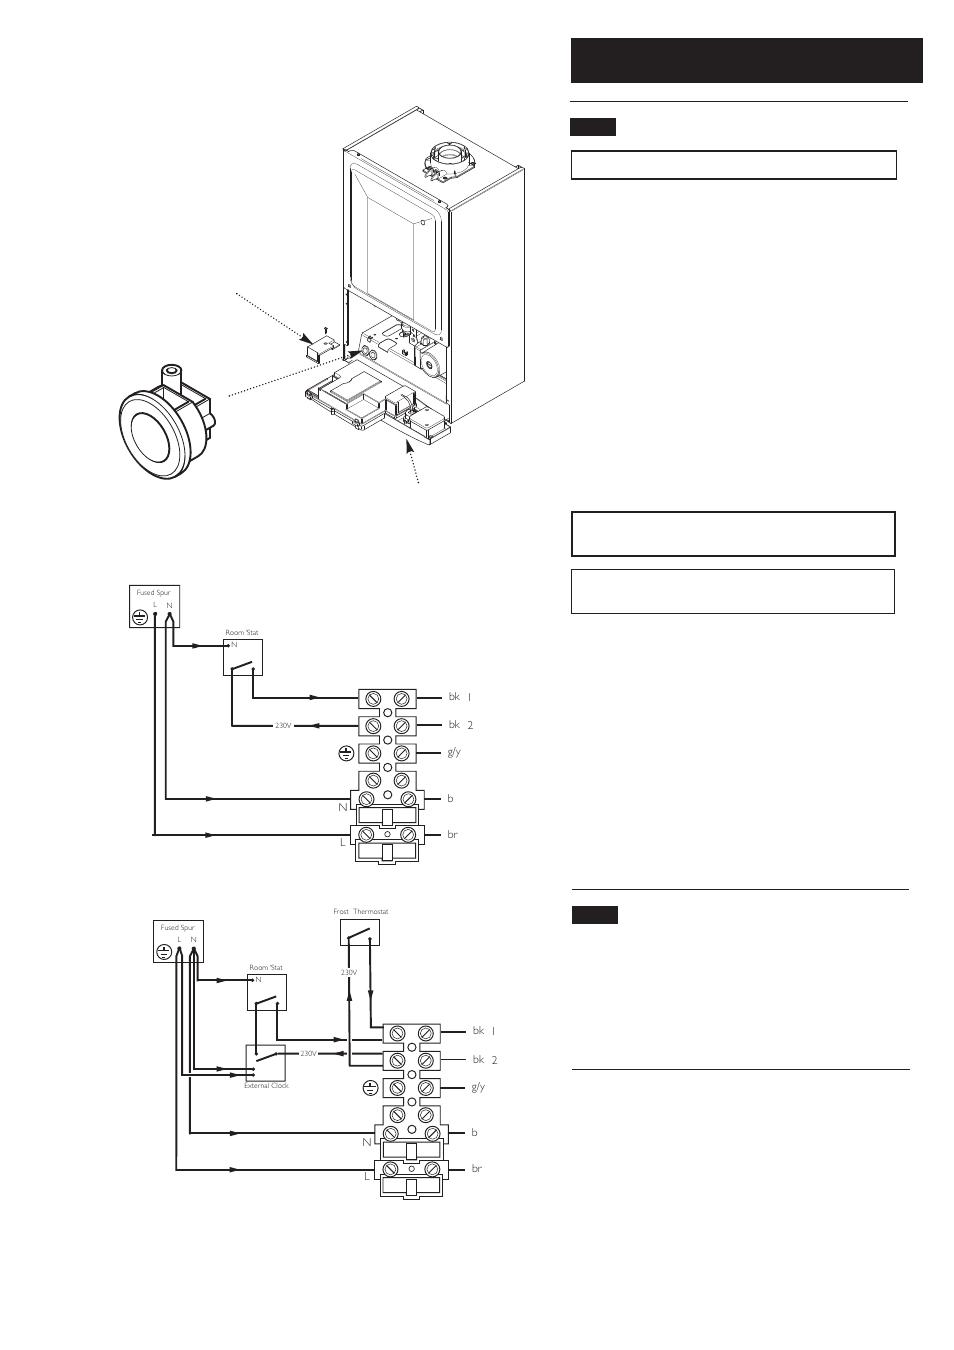 0 installation baxi potterton heatmax combi he condensing 0 installation baxi potterton heatmax combi he condensing combination boiler user manual page 33 60 cheapraybanclubmaster Choice Image